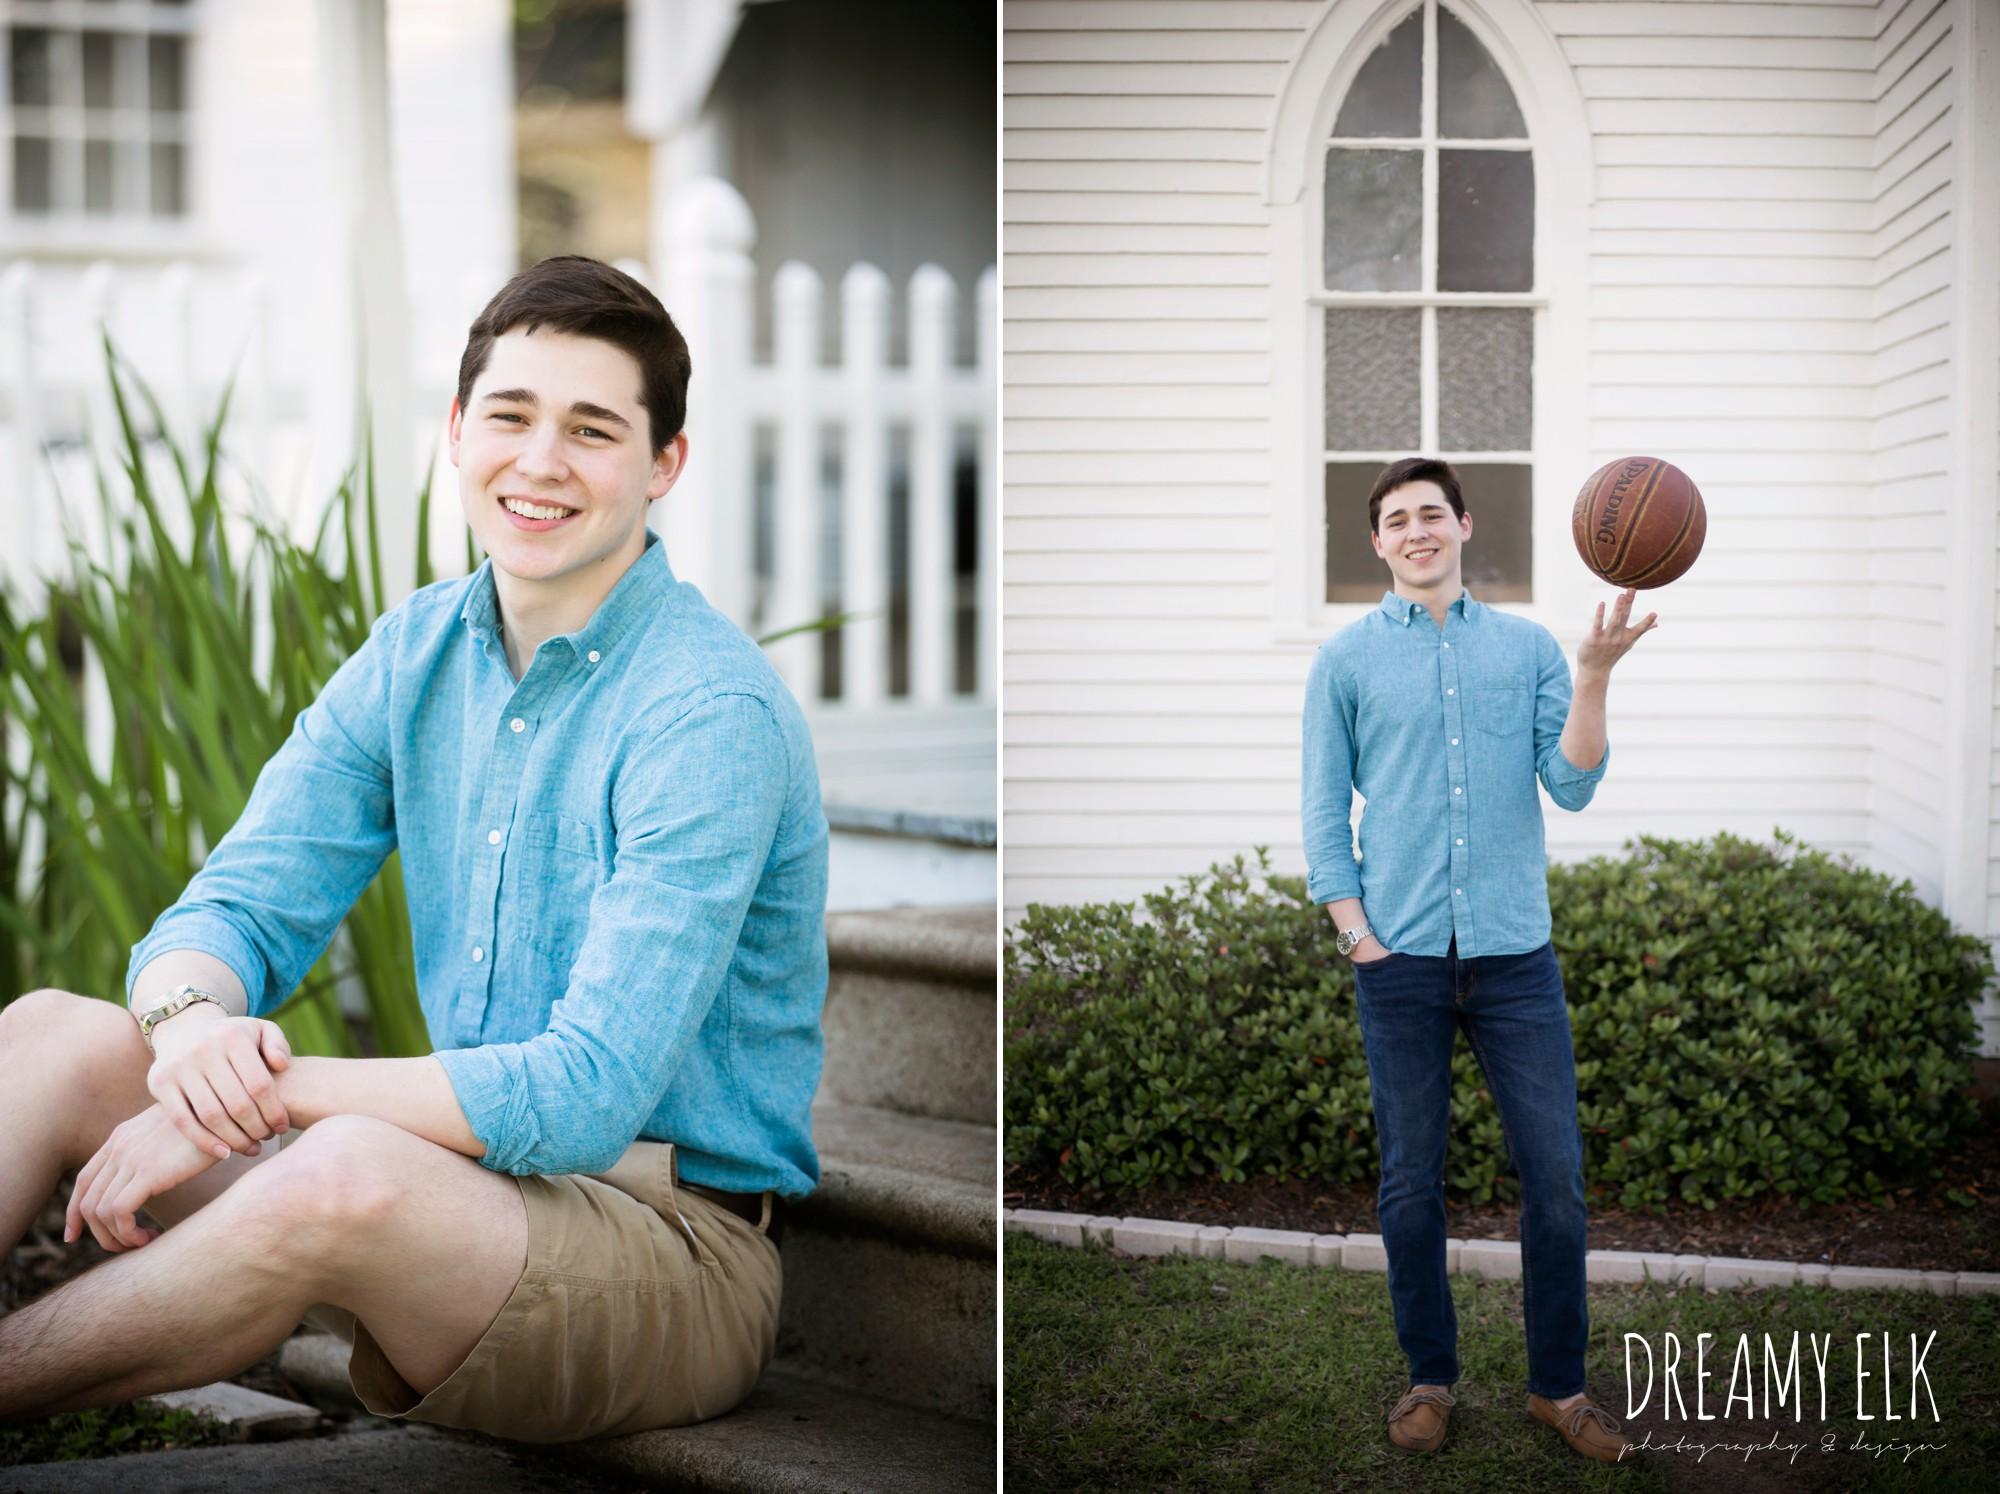 spring, march, high school senior boy, basketball player, senior photo, tomball, texas {dreamy elk photography and design}